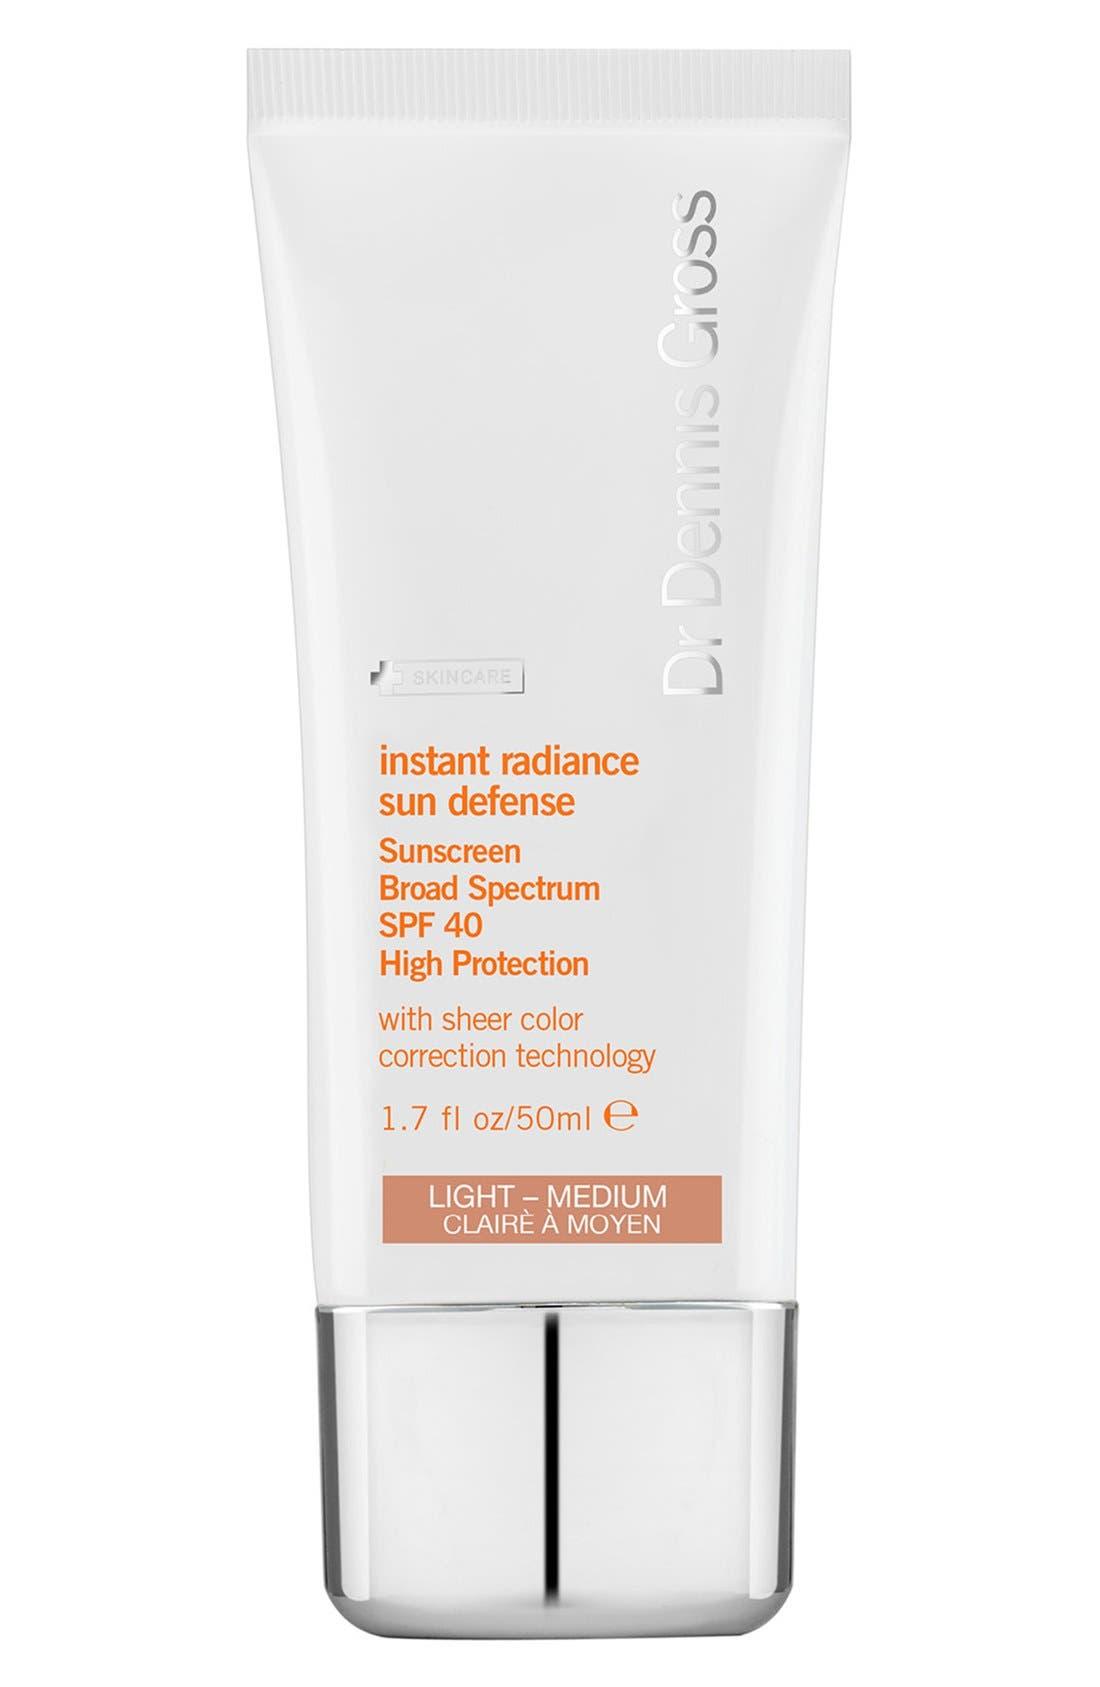 Dr. Dennis Gross Skincare 'Instant Radiance' Sun Defense Sunscreen Broad Spectrum SPF 40